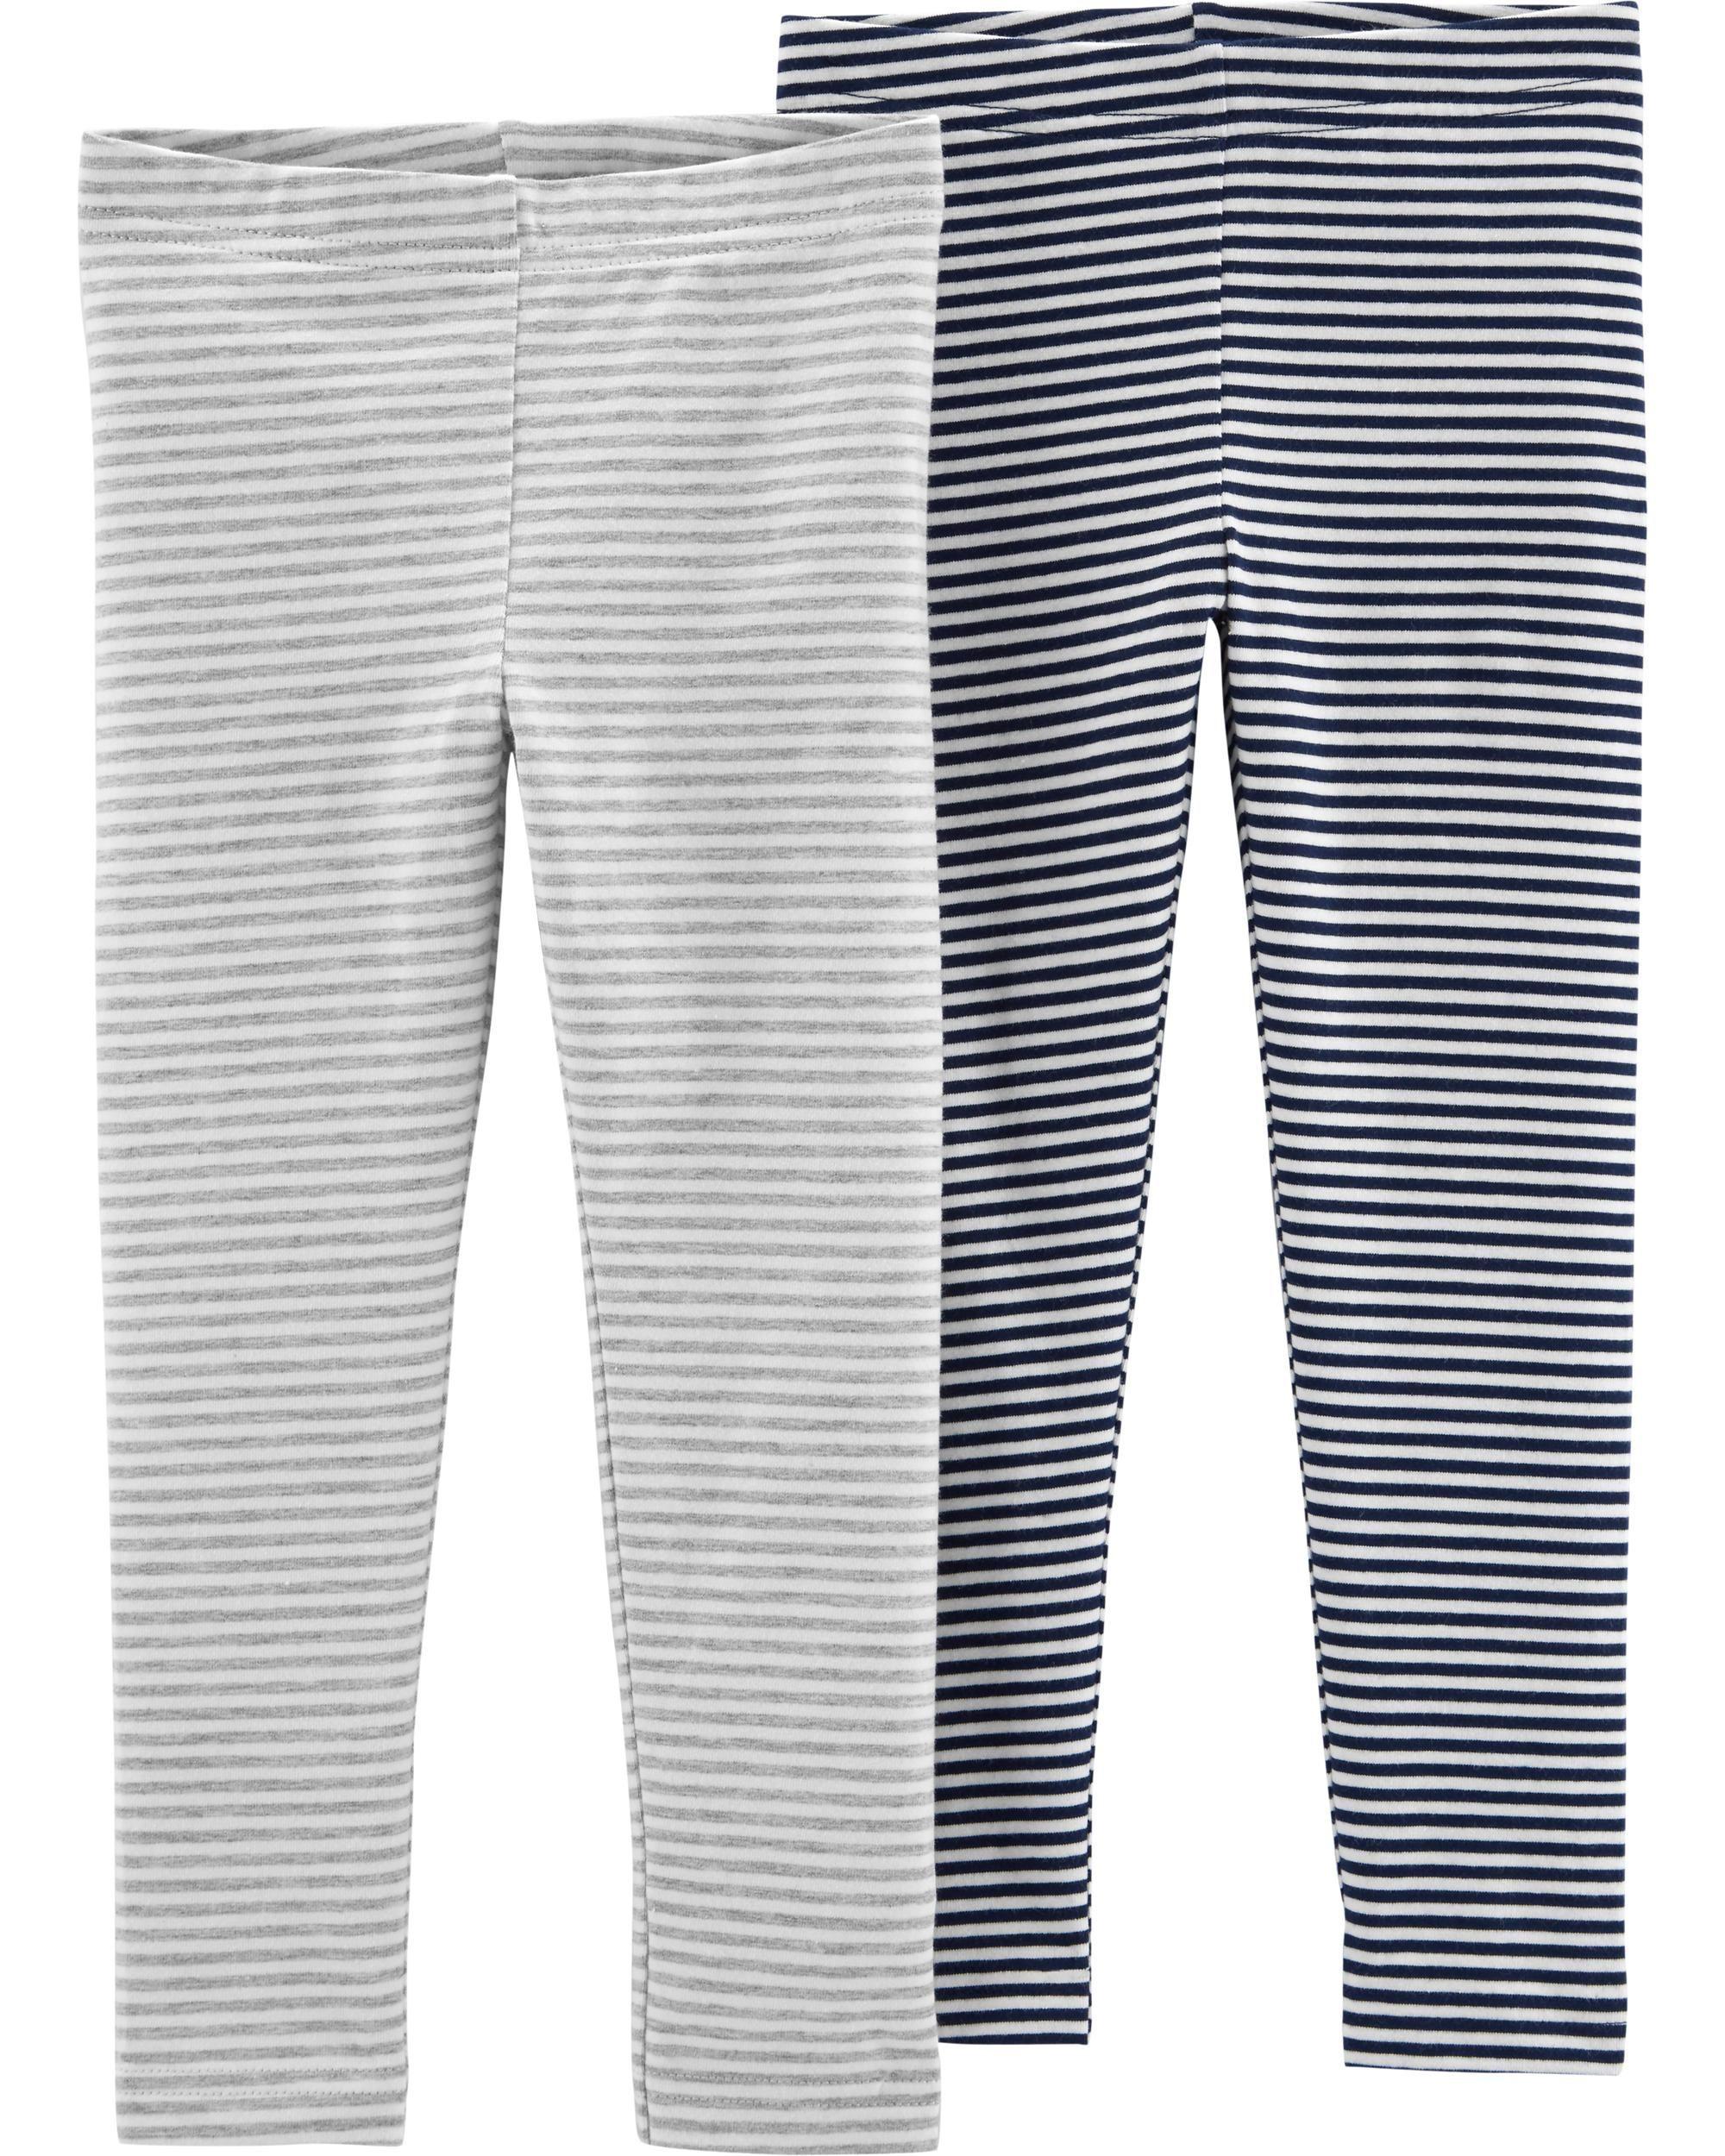 6a7a454220f3d 2-Pack Striped Leggings | Charlotte's Wish List | Striped leggings ...